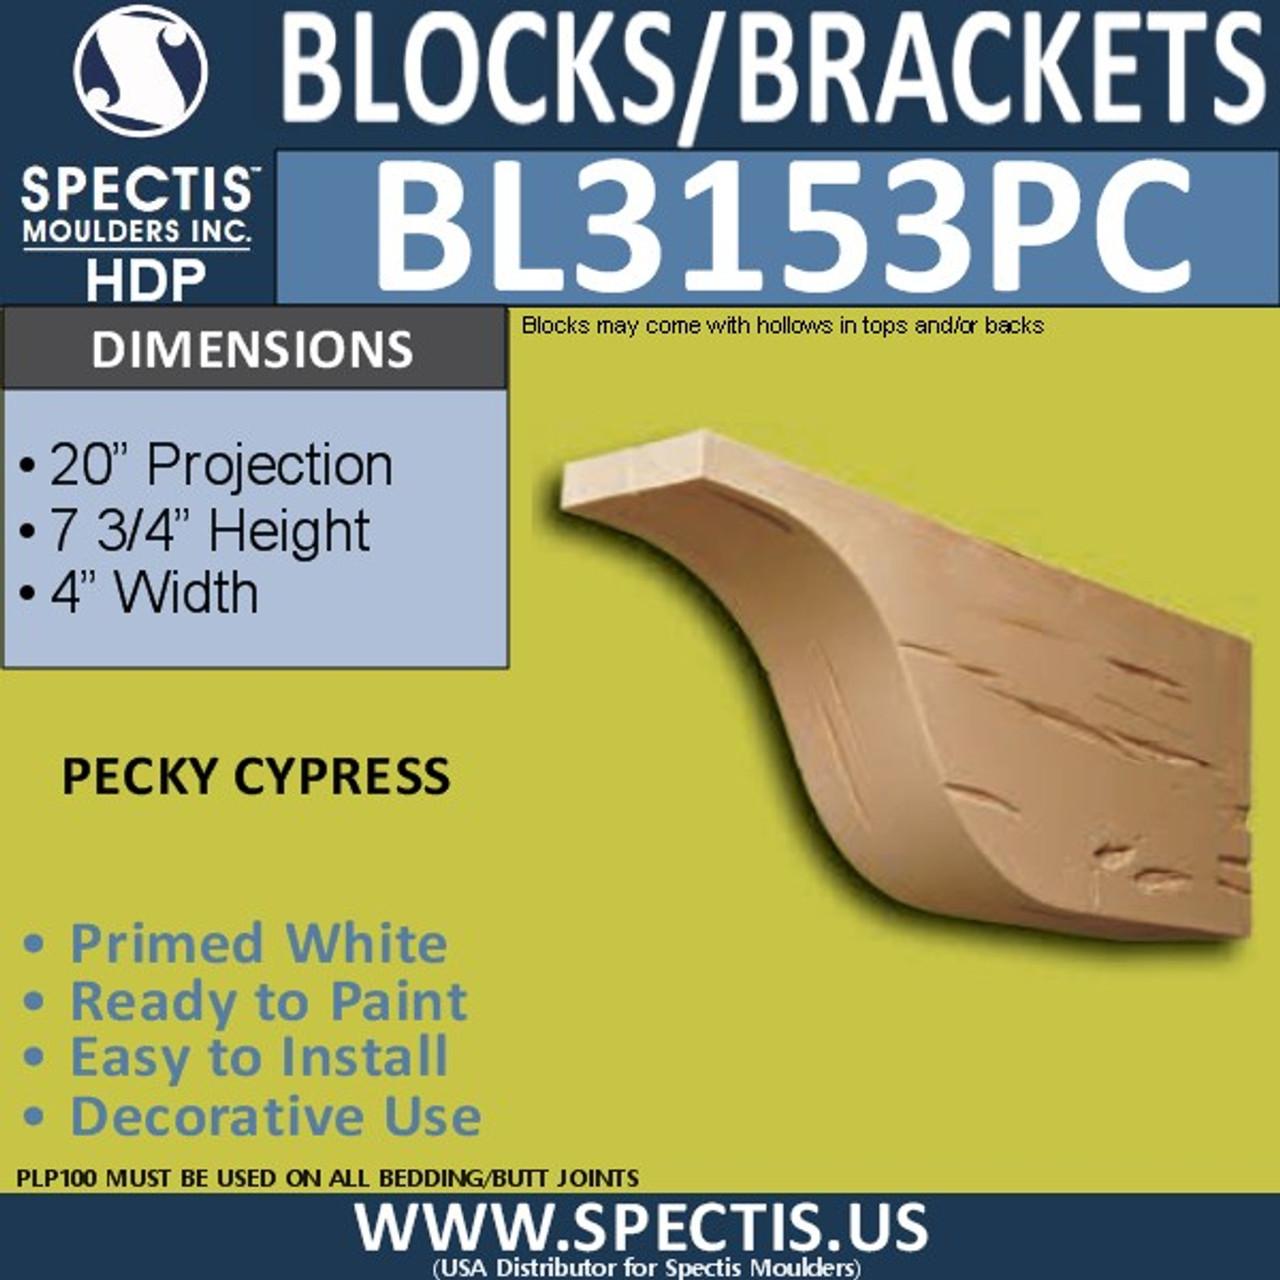 "BL3153PC Pecky Cypress Eave Block or Bracket 4""W x 7.75""H x 20""P"